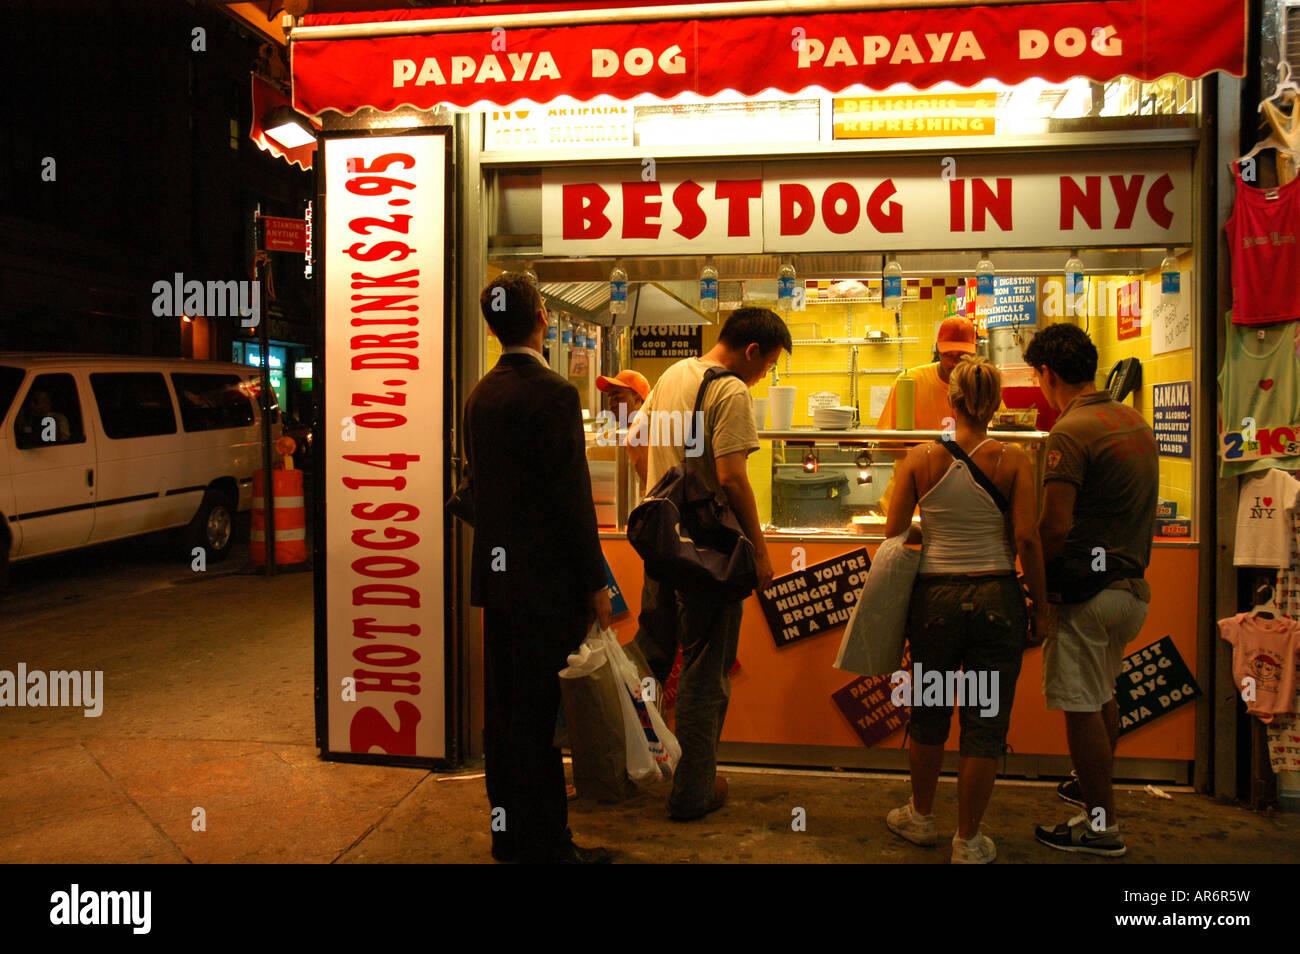 hot dog shop in the street new york usa puesto de hot dogs en la stock photo royalty free image. Black Bedroom Furniture Sets. Home Design Ideas